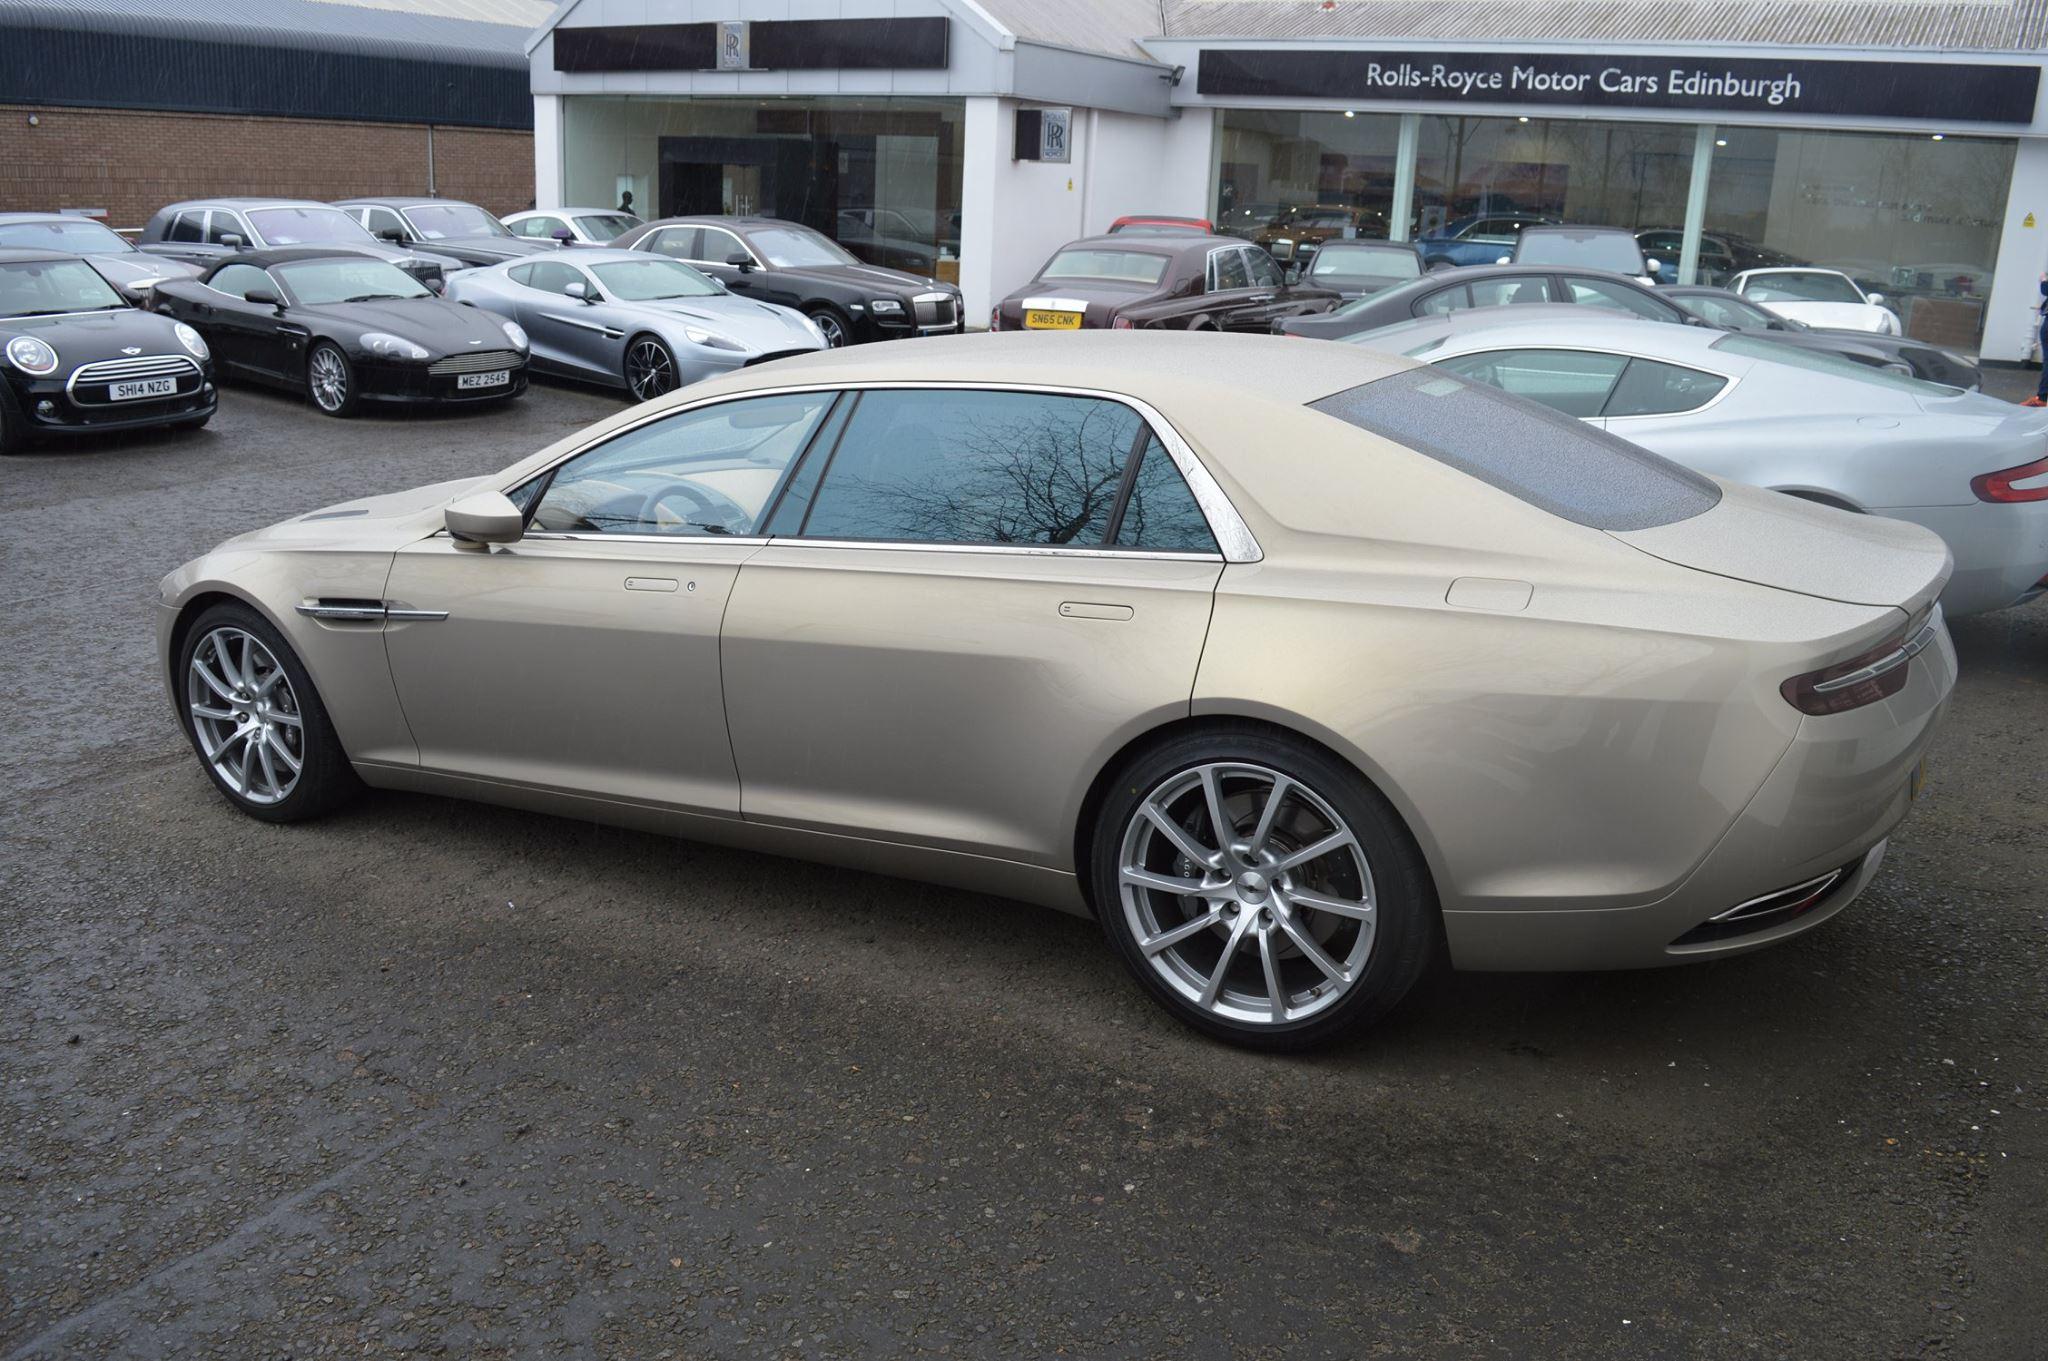 Rare Aston Martin Lagonda Taraf Snapped in Scotland - GTspirit on